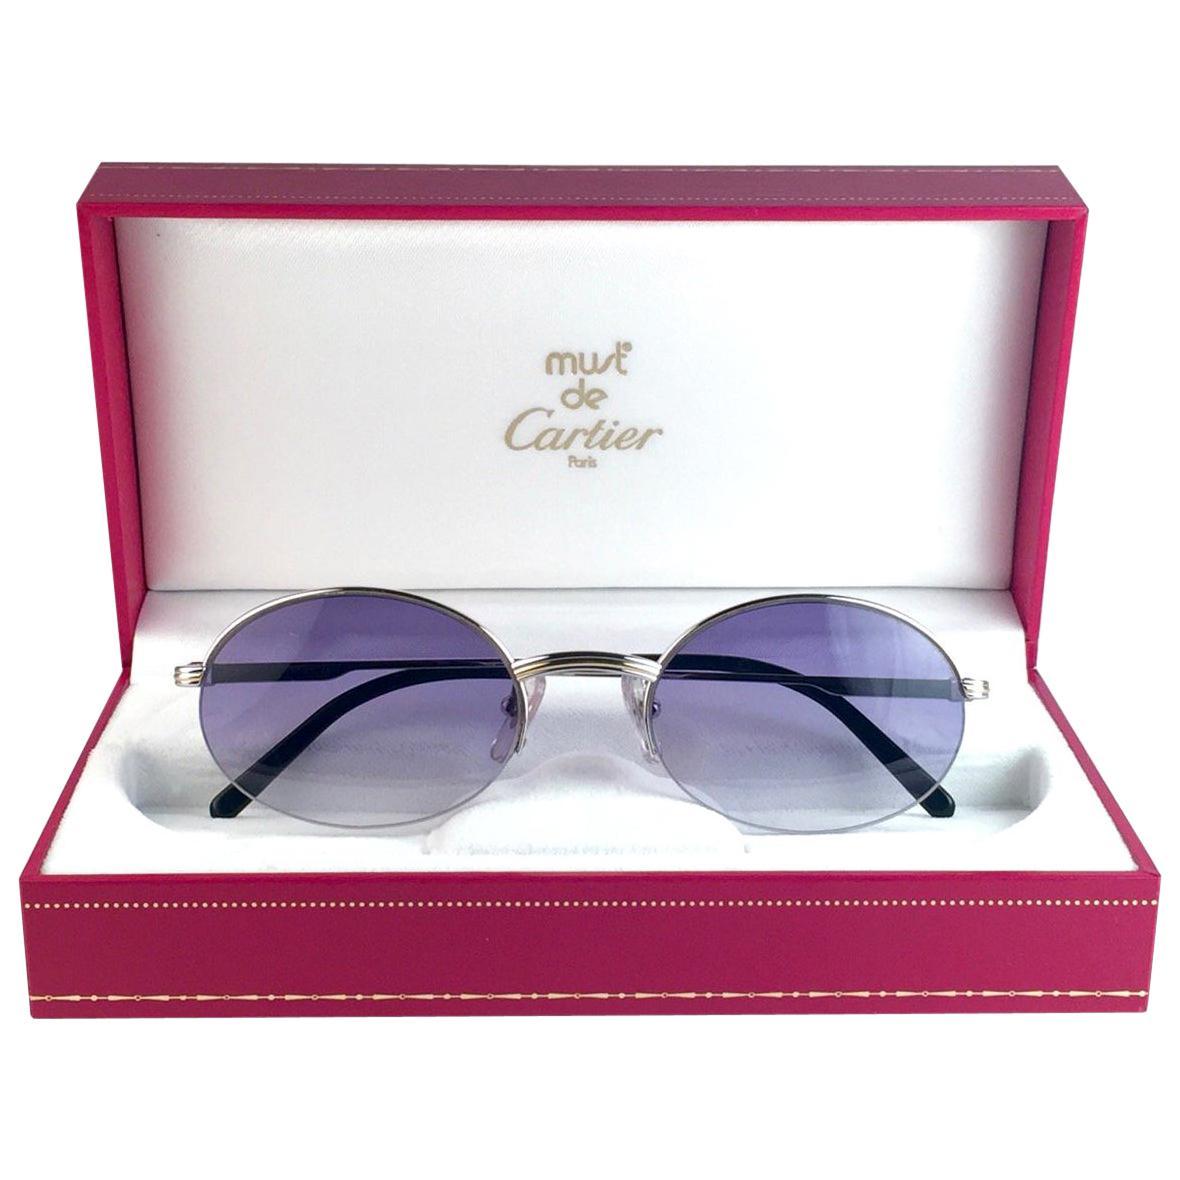 New Cartier Oval Platine Manhattan 51mm Frame 18k Plated Sunglasses France